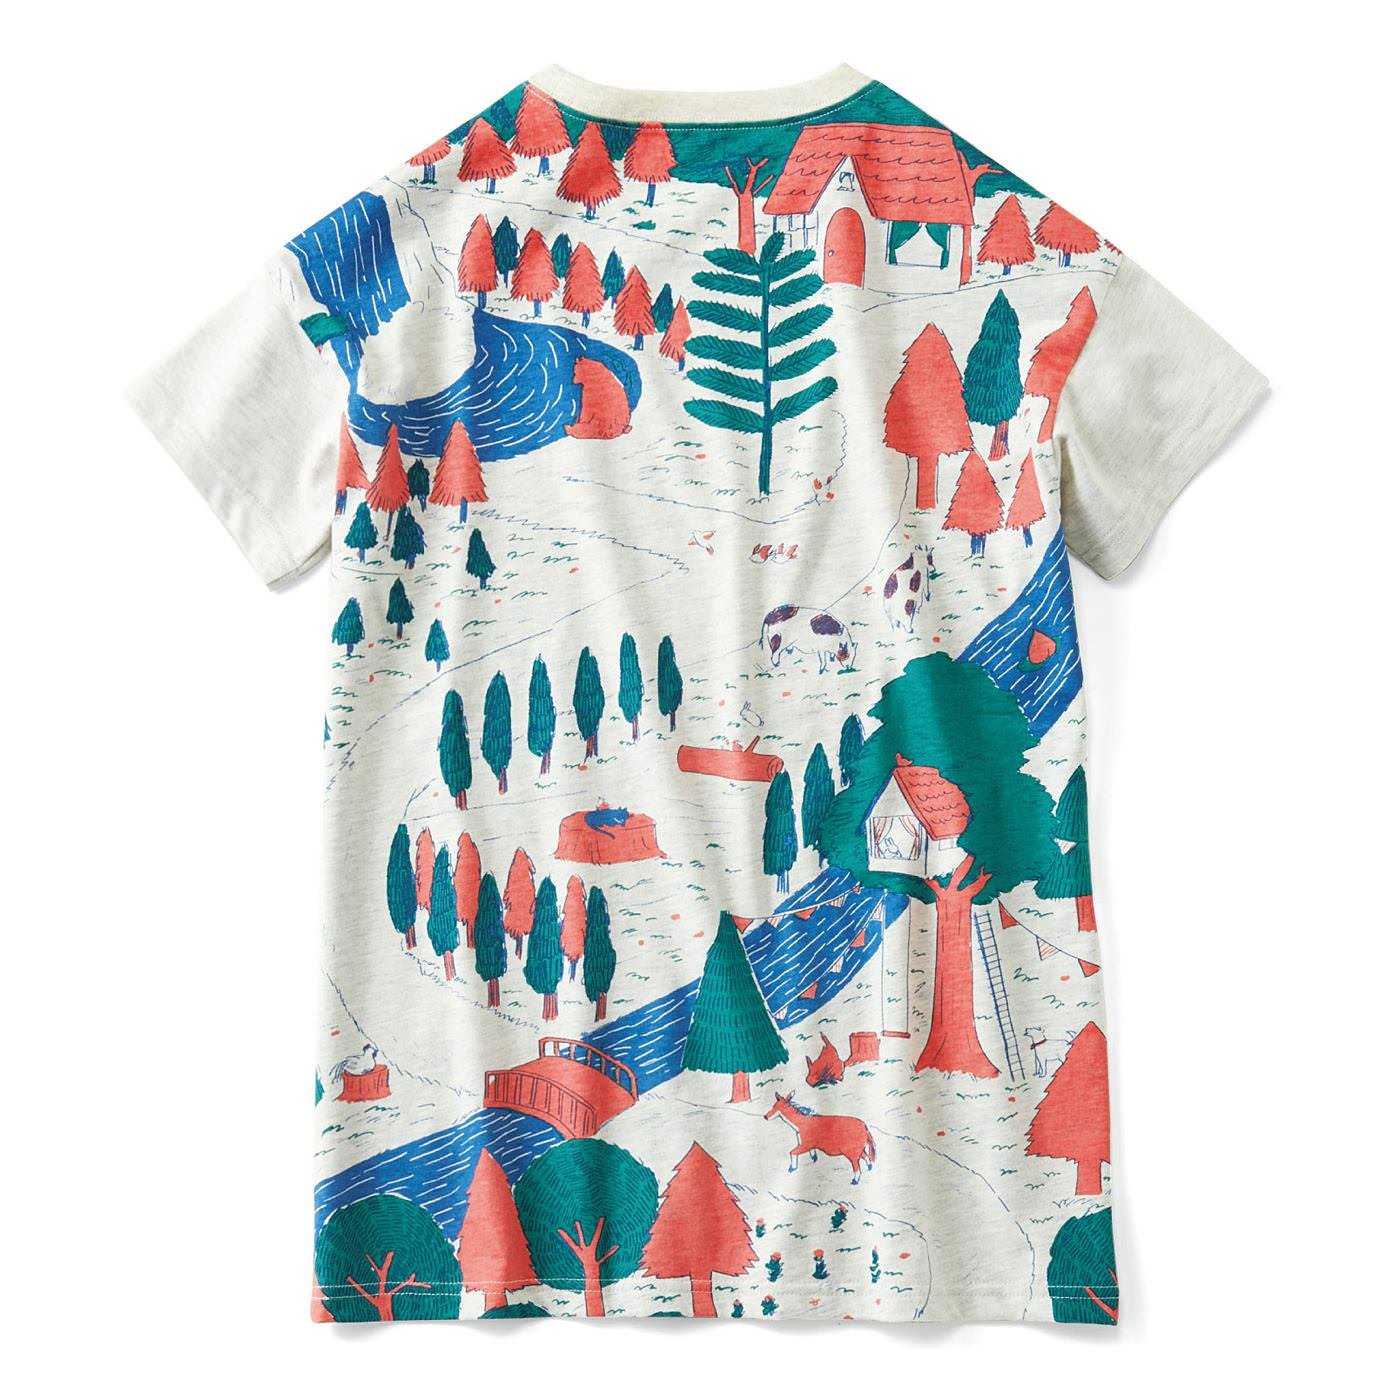 YOU+MORE! 寝ころび保育 パパドーロTシャツ〈森の小径〉